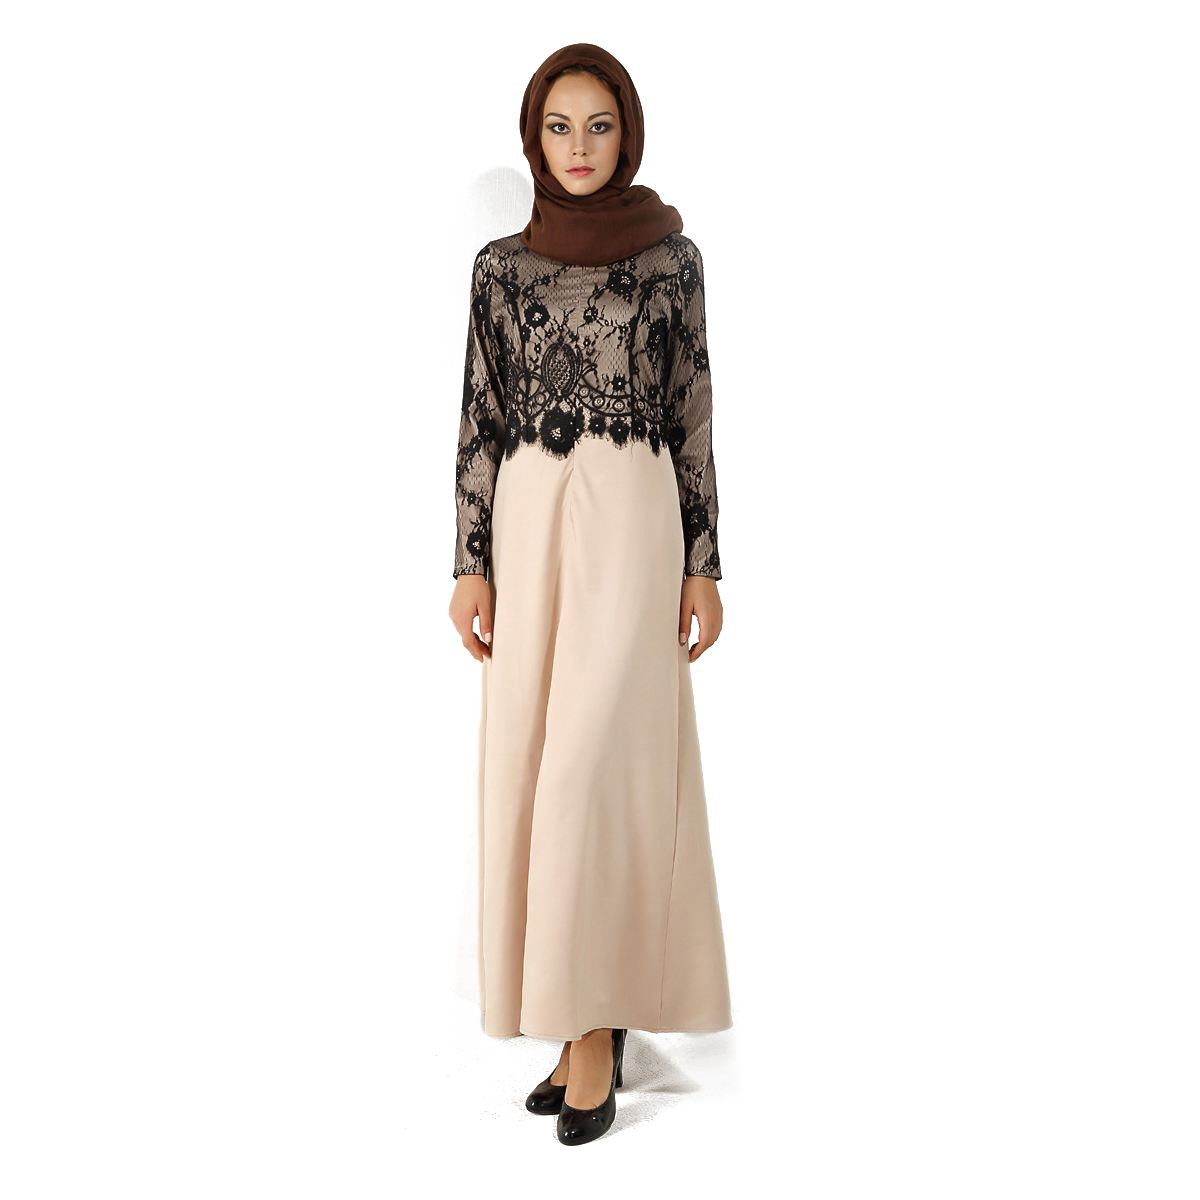 Womens New Spring Autumn Noble Muslim Dress Lace Kaftan Abaya Ladies Long Sleeve Elegant Islamic Maxi Dress